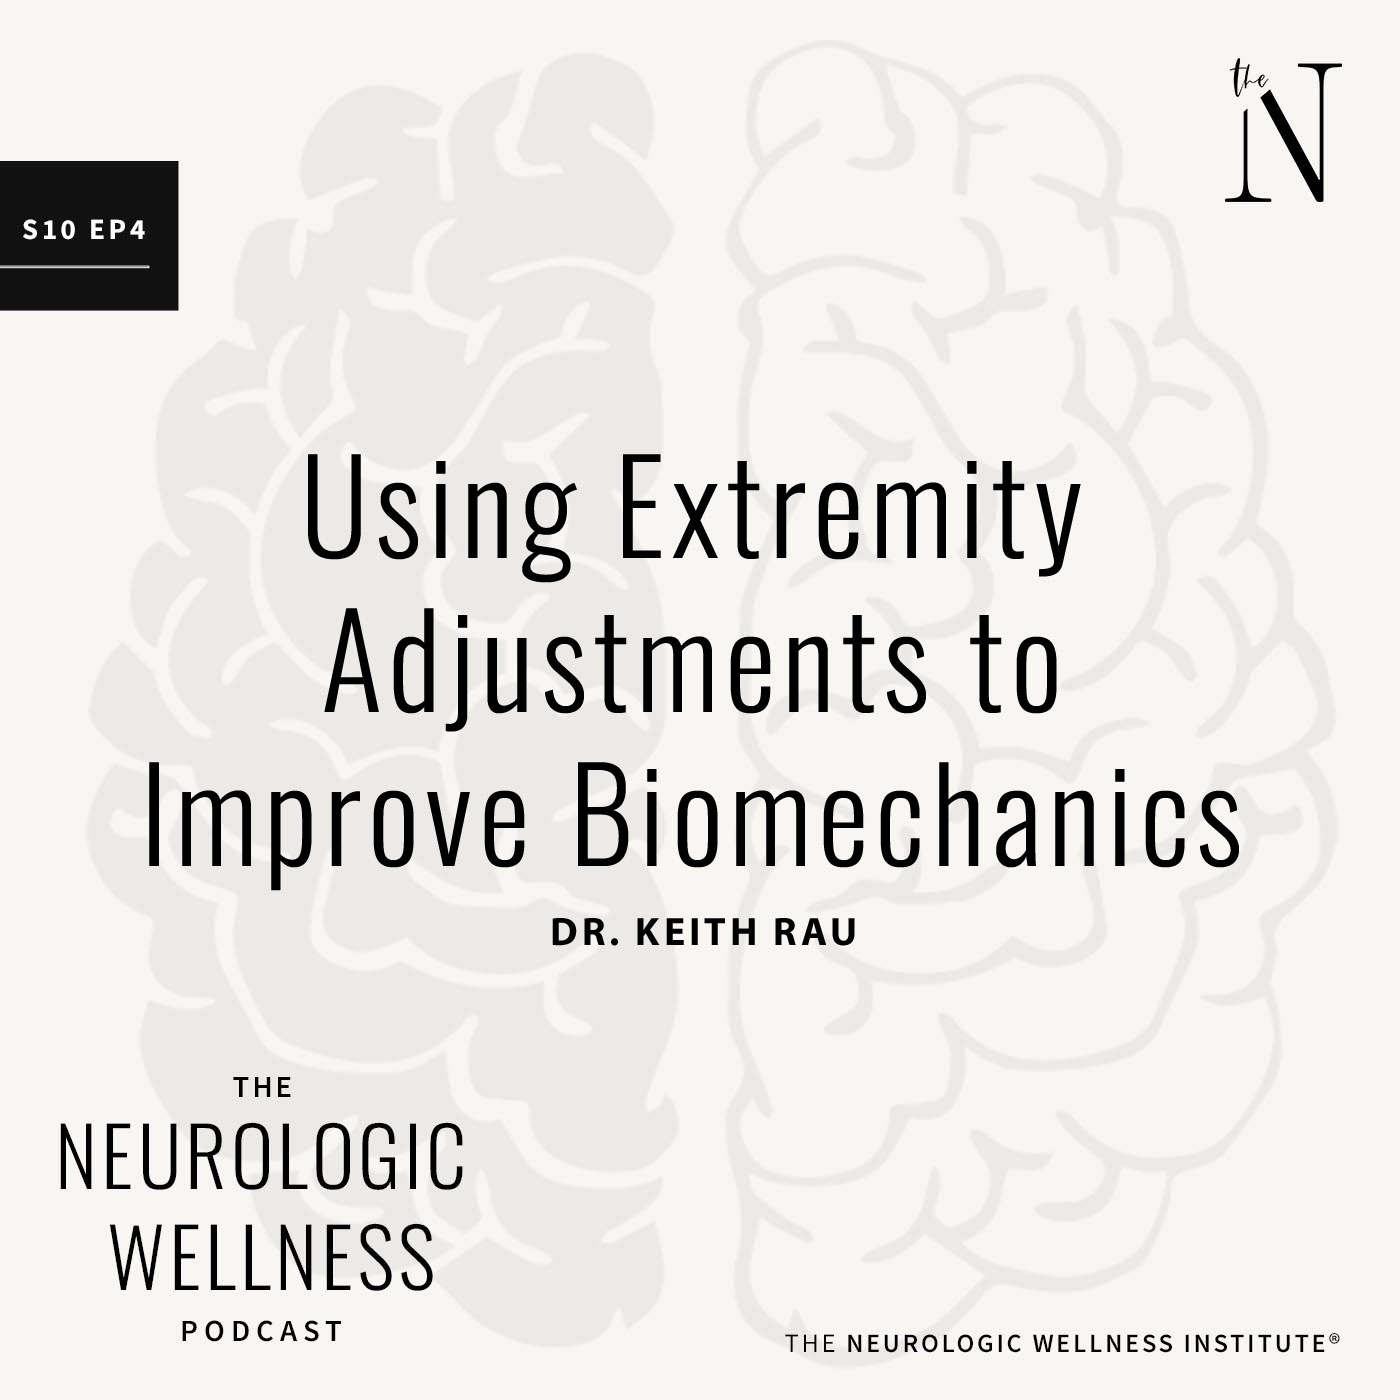 Using Extremity Adjustments to Improve Biomechanics